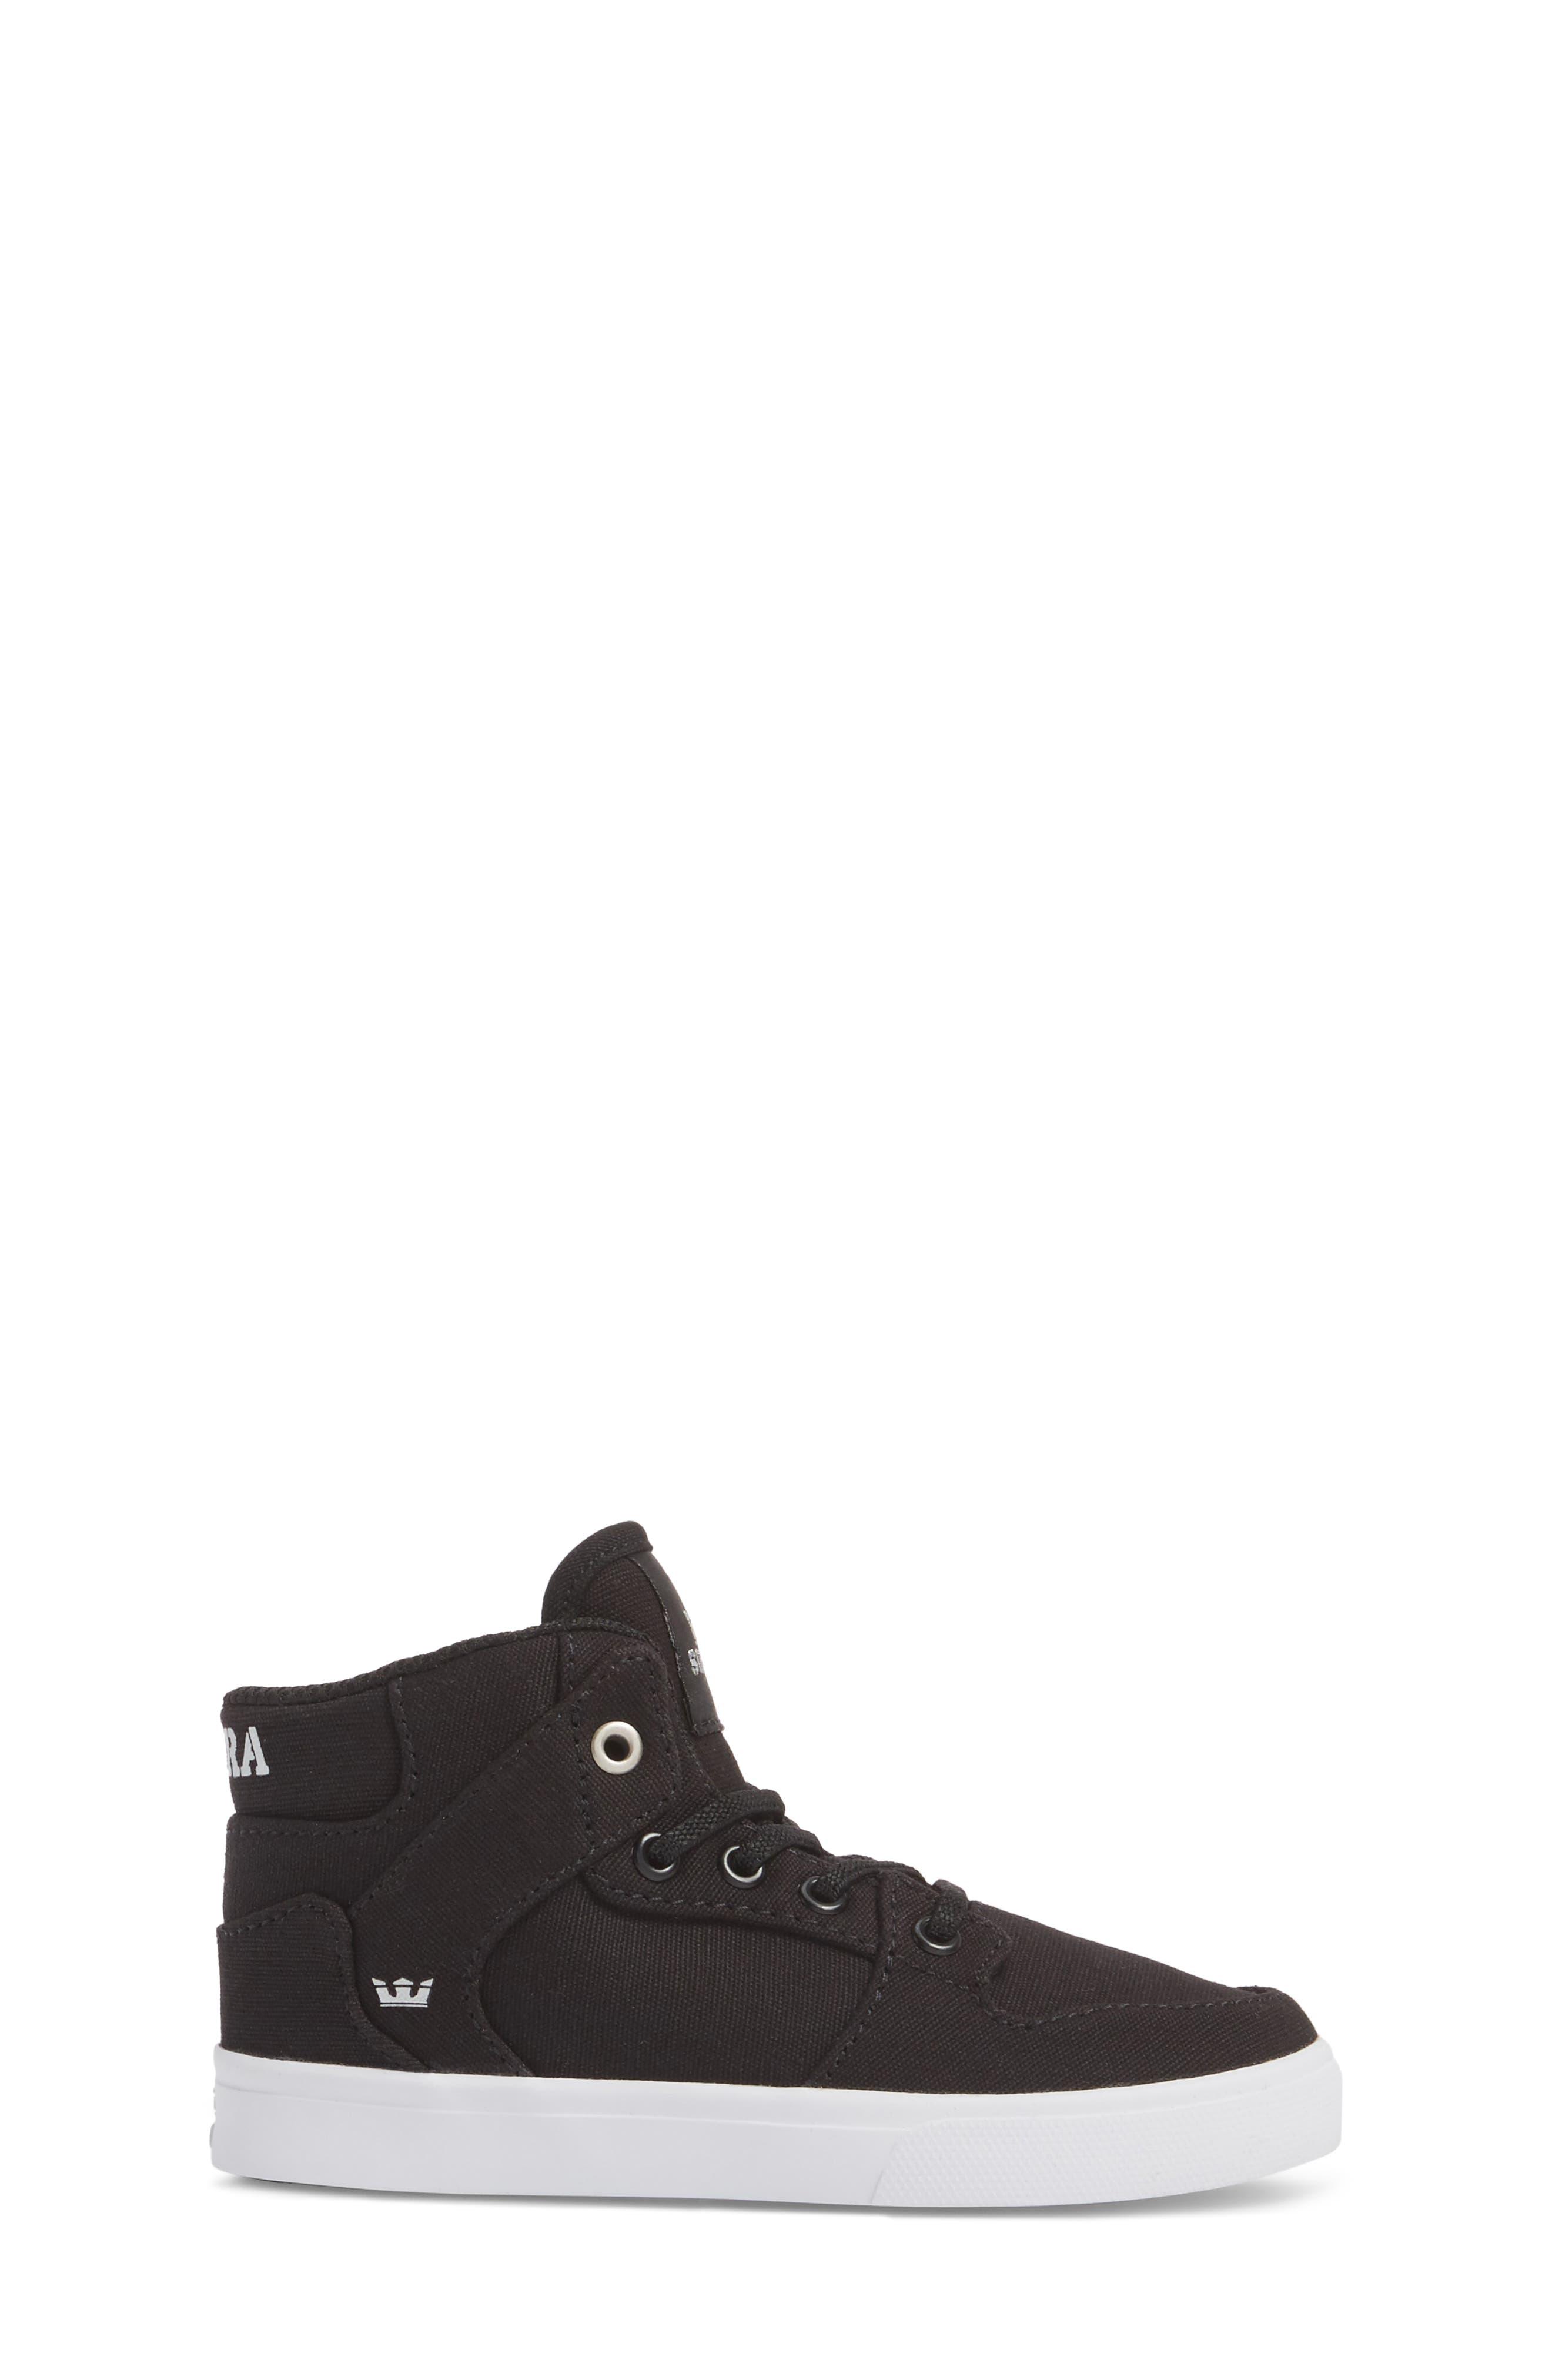 'Vaider' High Top Sneaker,                             Alternate thumbnail 3, color,                             Black/ White